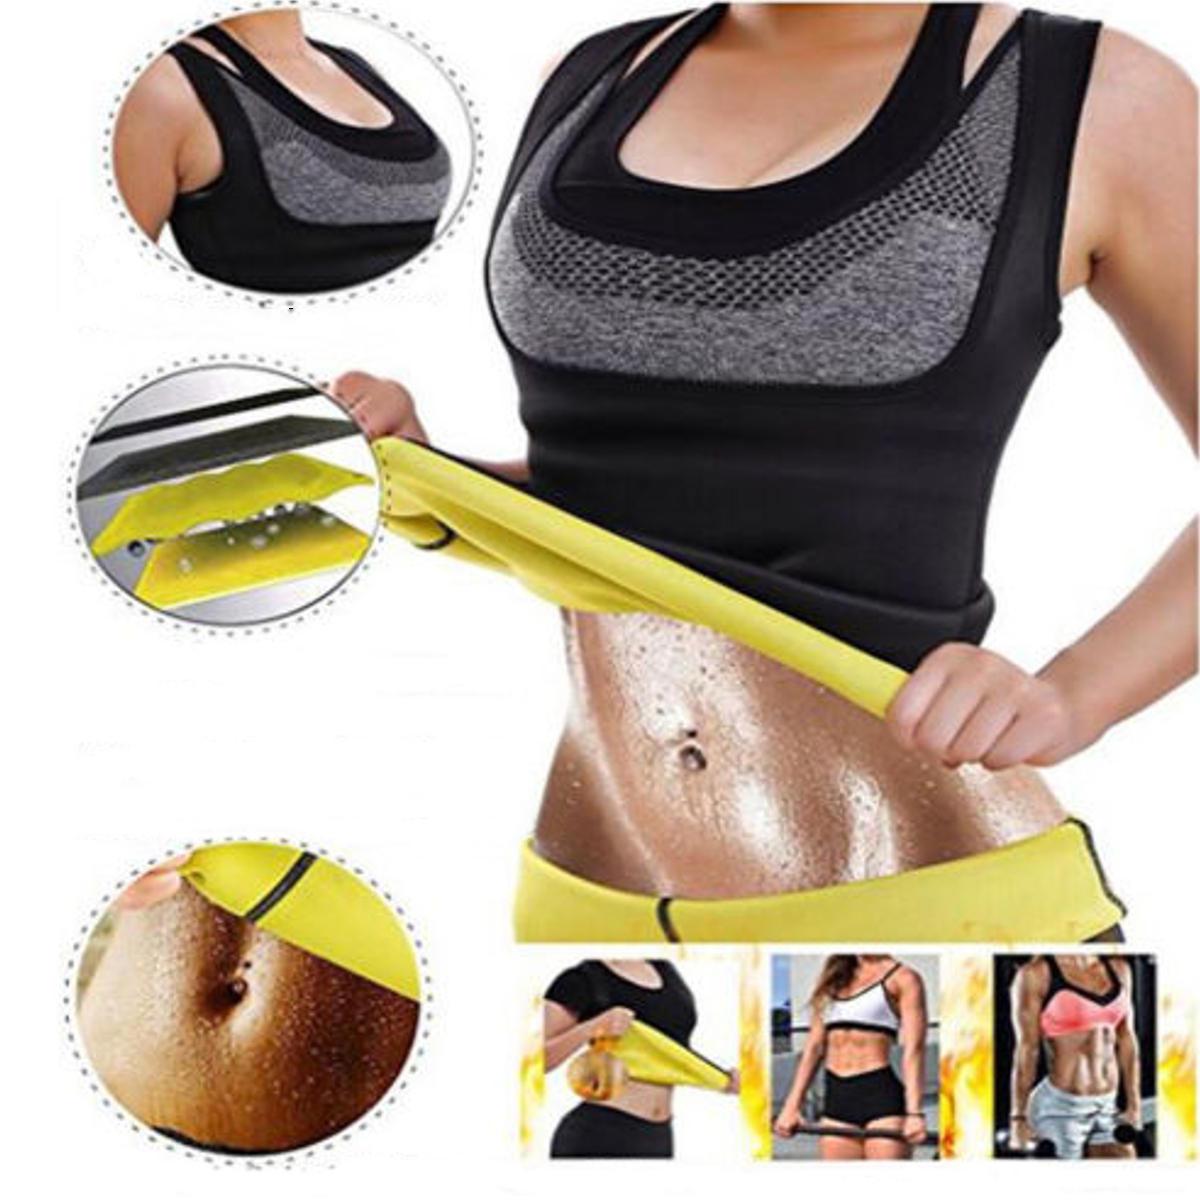 Wanita Slimming Hot Keringat Rompi Pembentuk Tubuh Kontrol Neoprene Tummy Fat Burner Shapewear Olahraga